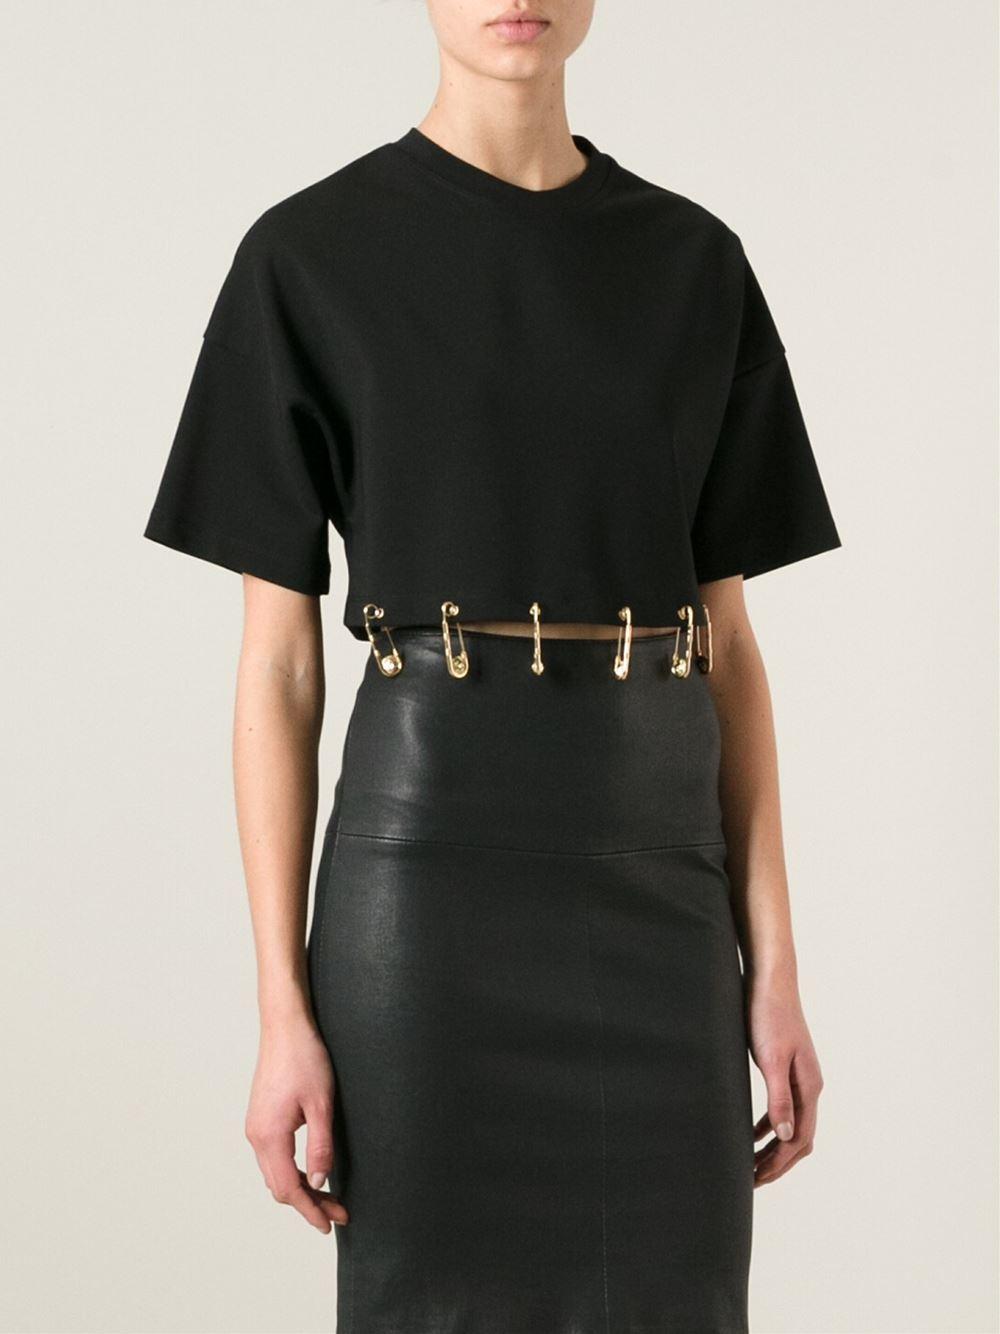 safety pin print T-shirt dress - Black Versus Vozy4mttM